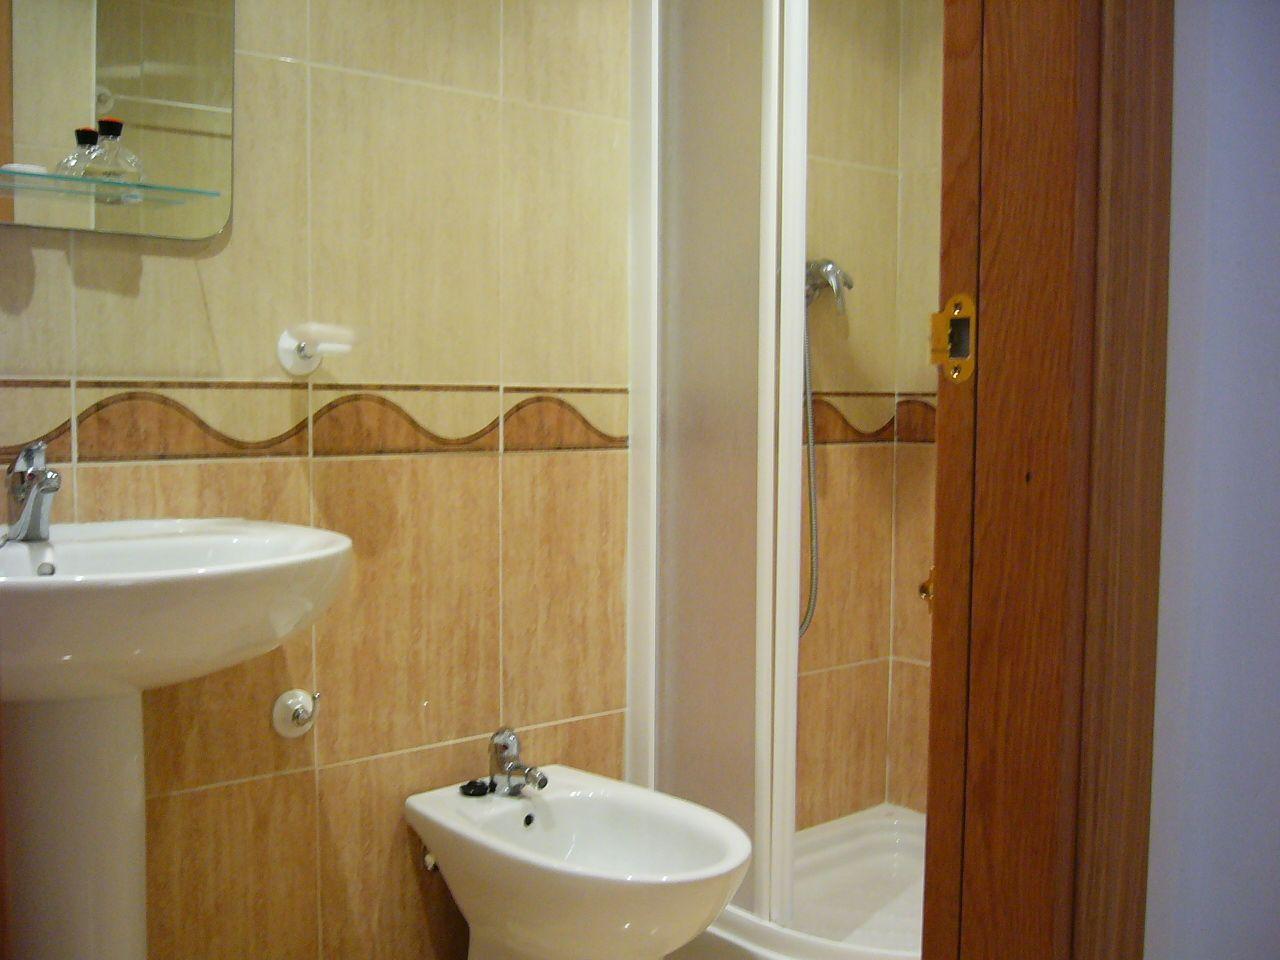 Marina d'Or Apartamentos - Cuarto de baño 2   Cuarto de ...